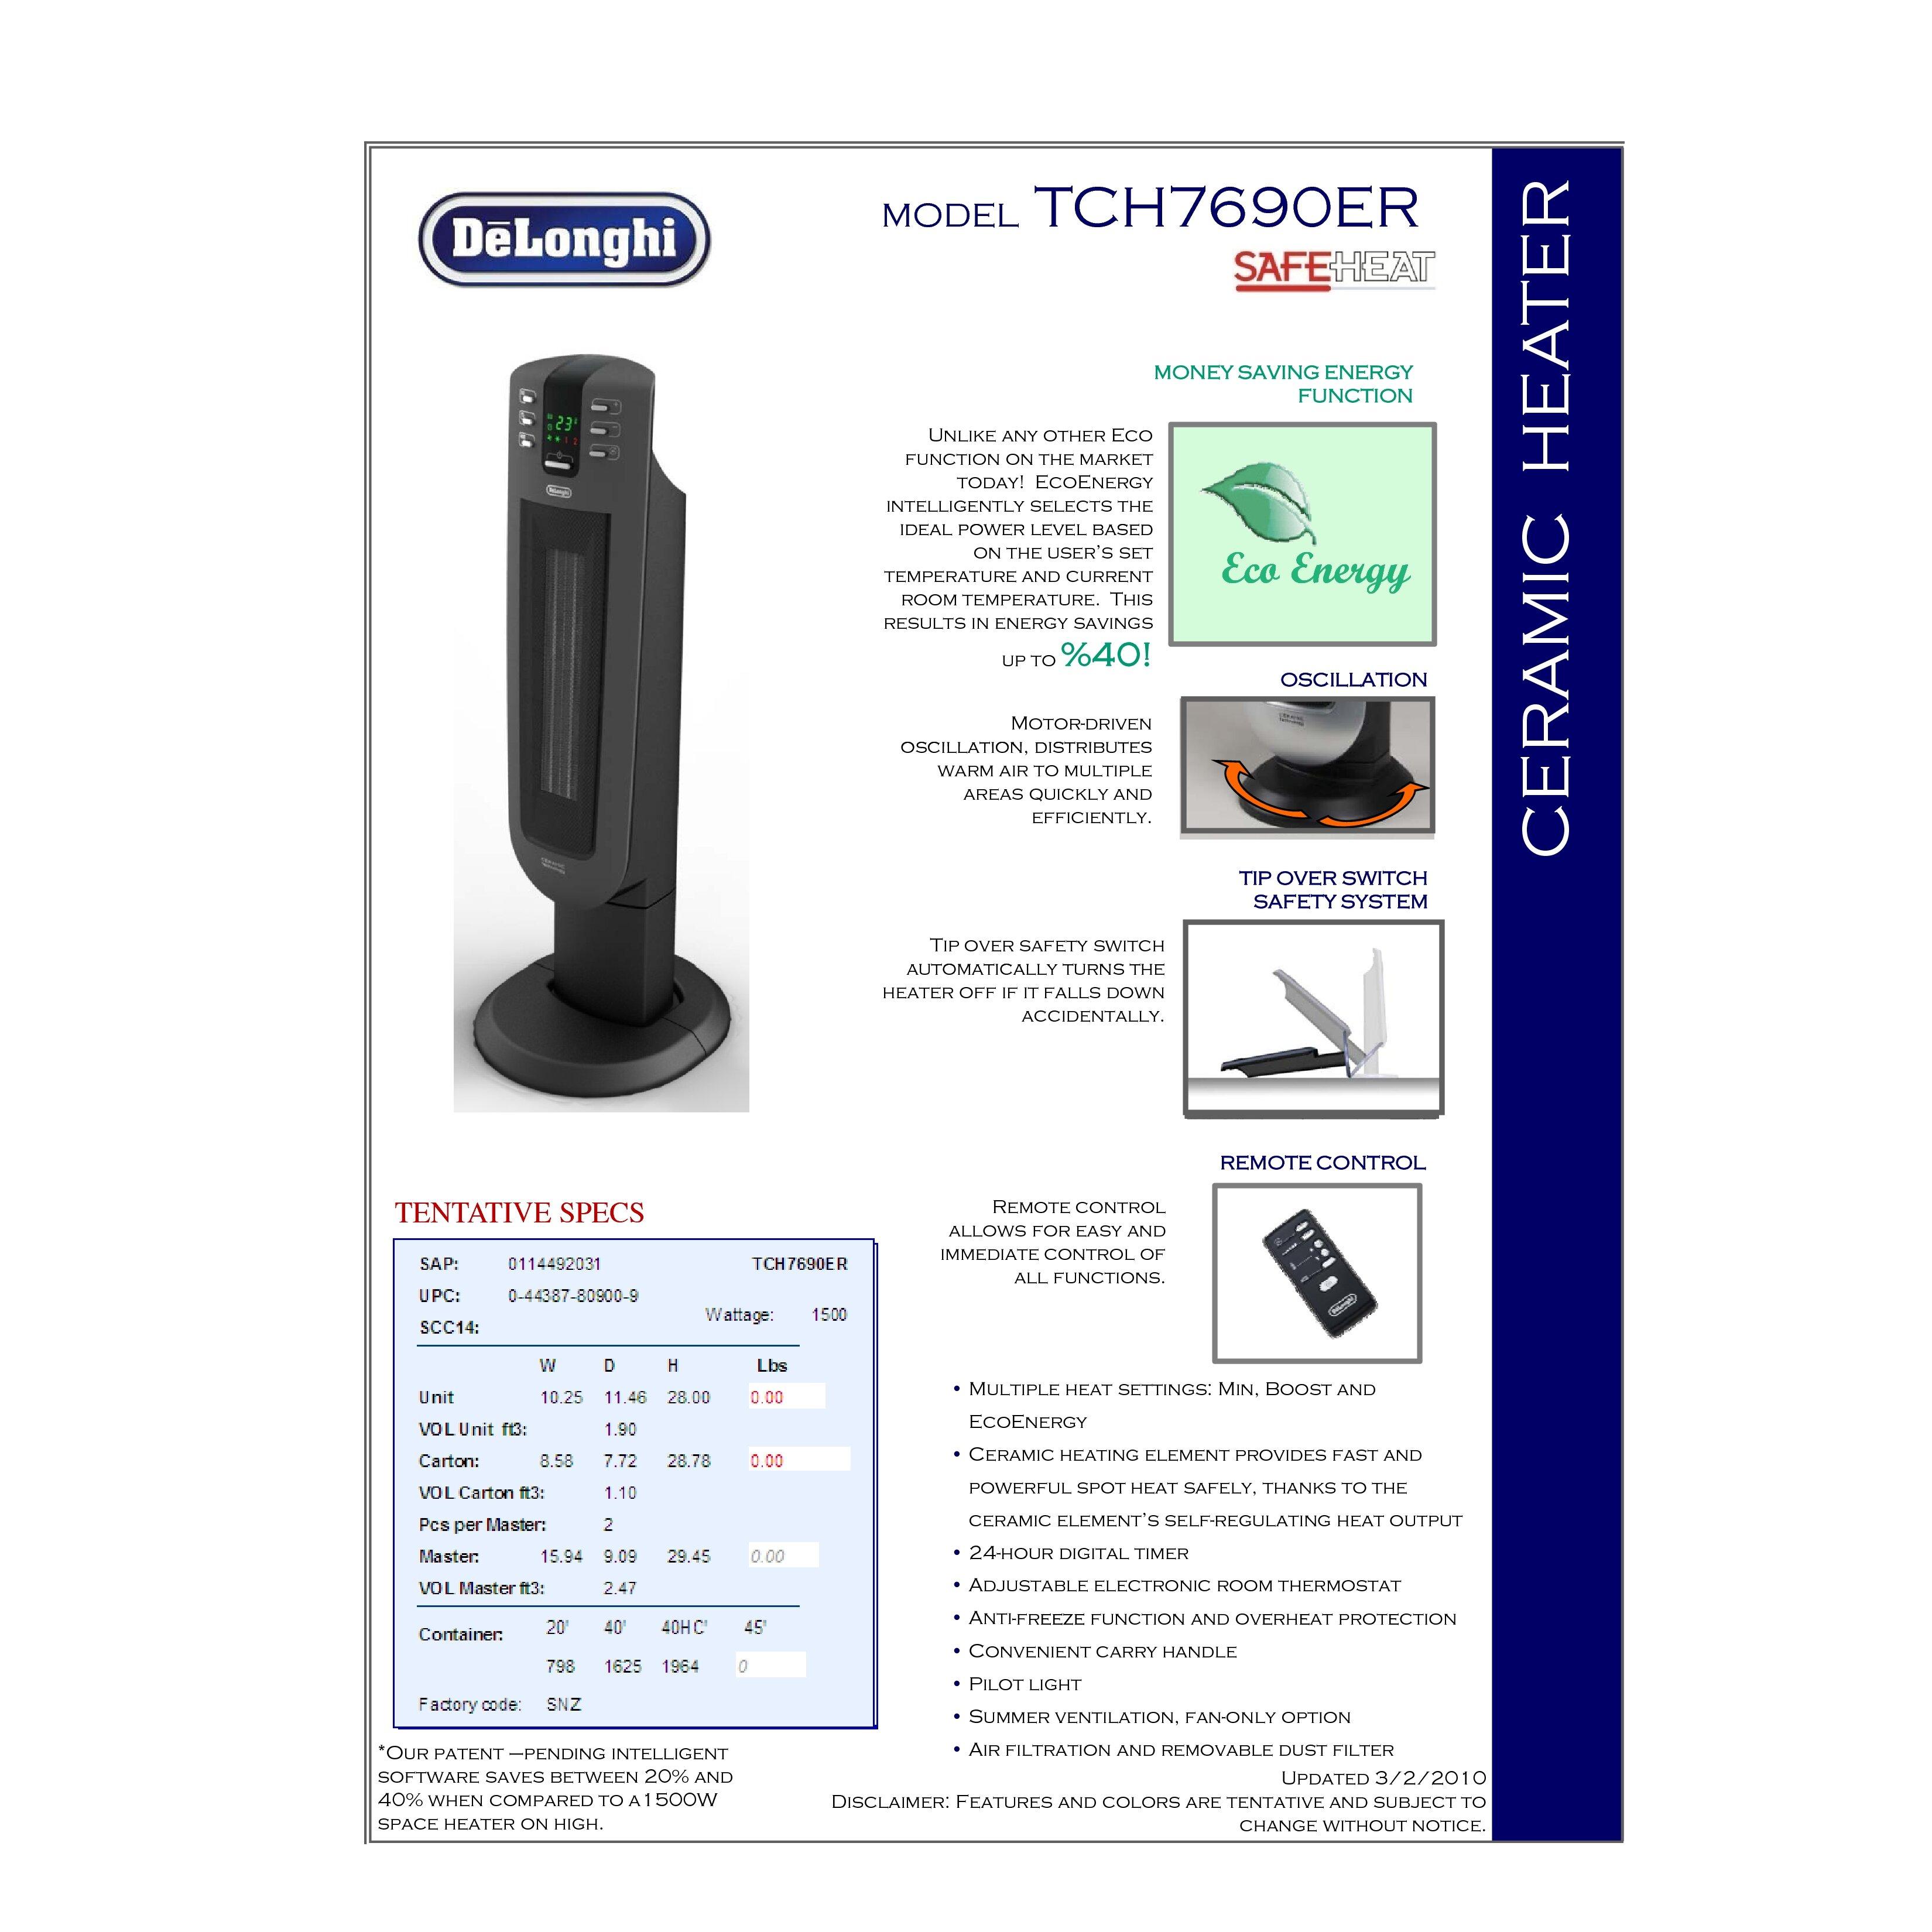 1,500 Watt Portable Electric Fan Tower Heater & Reviews | Wayfair